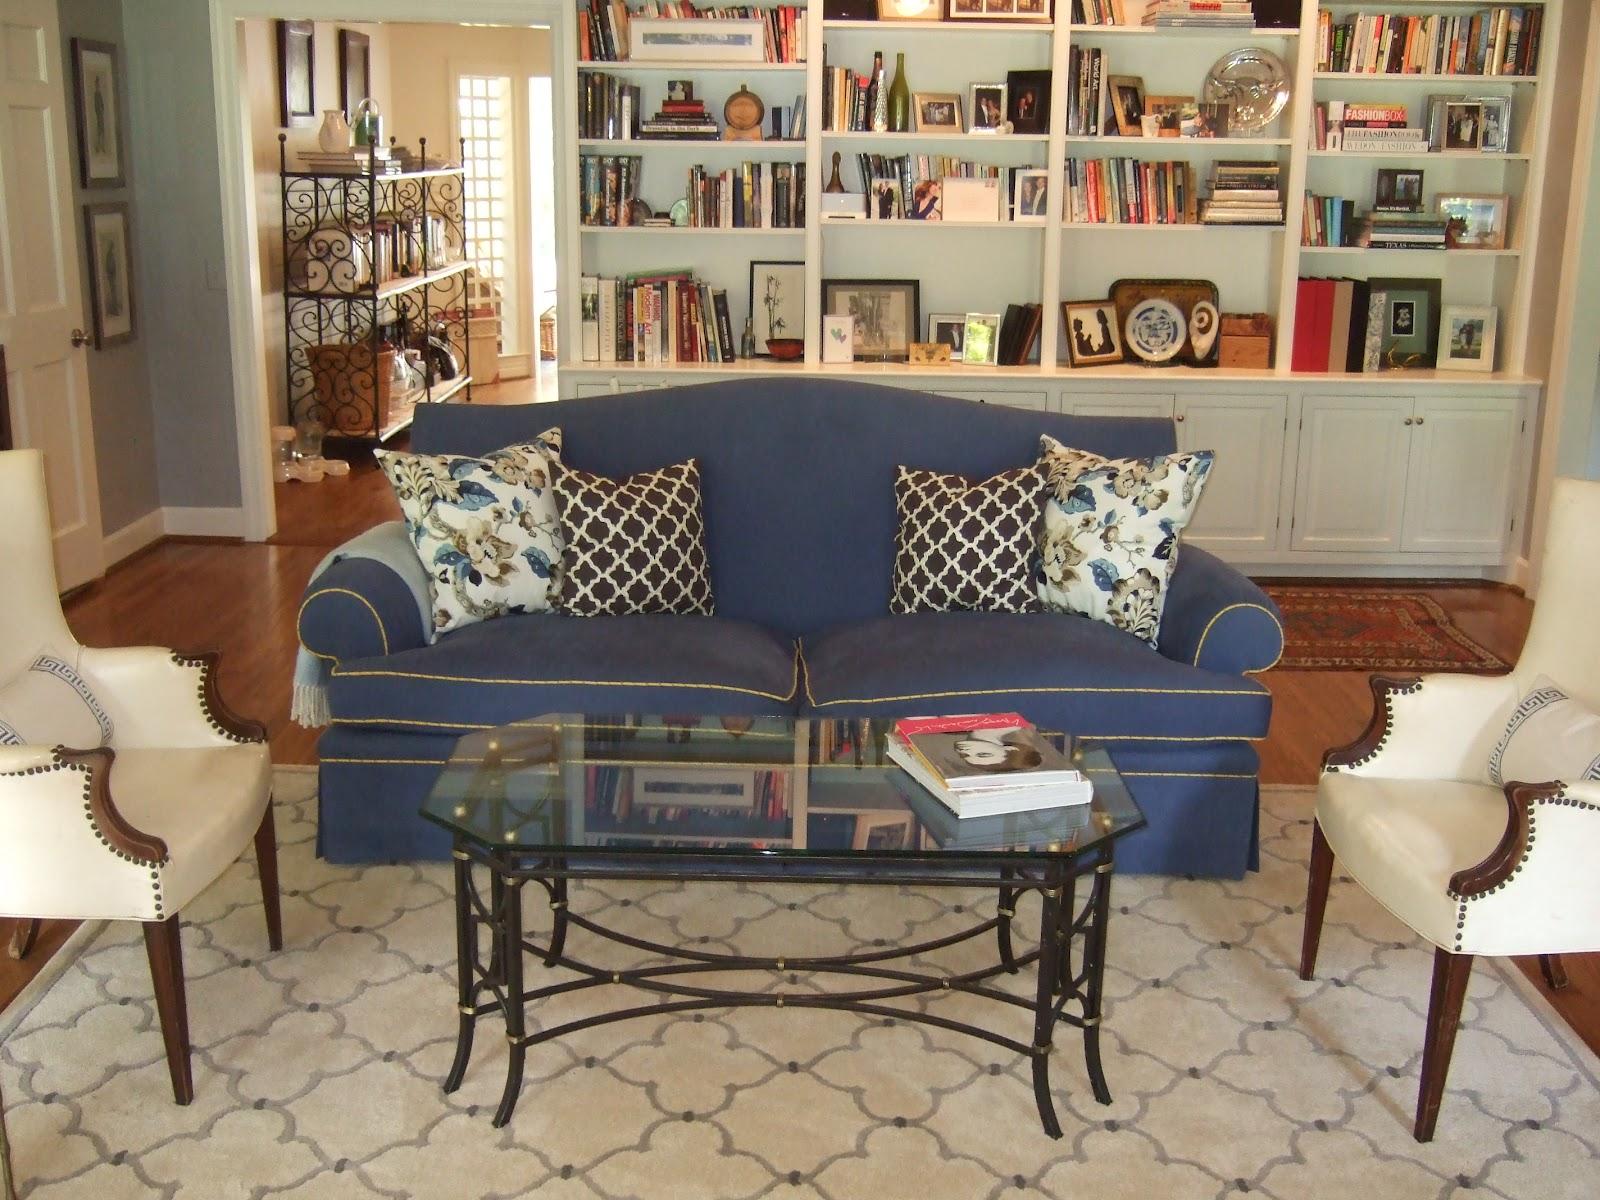 craigslist tulsa sofa sundance best slipcover for sectional design your unique